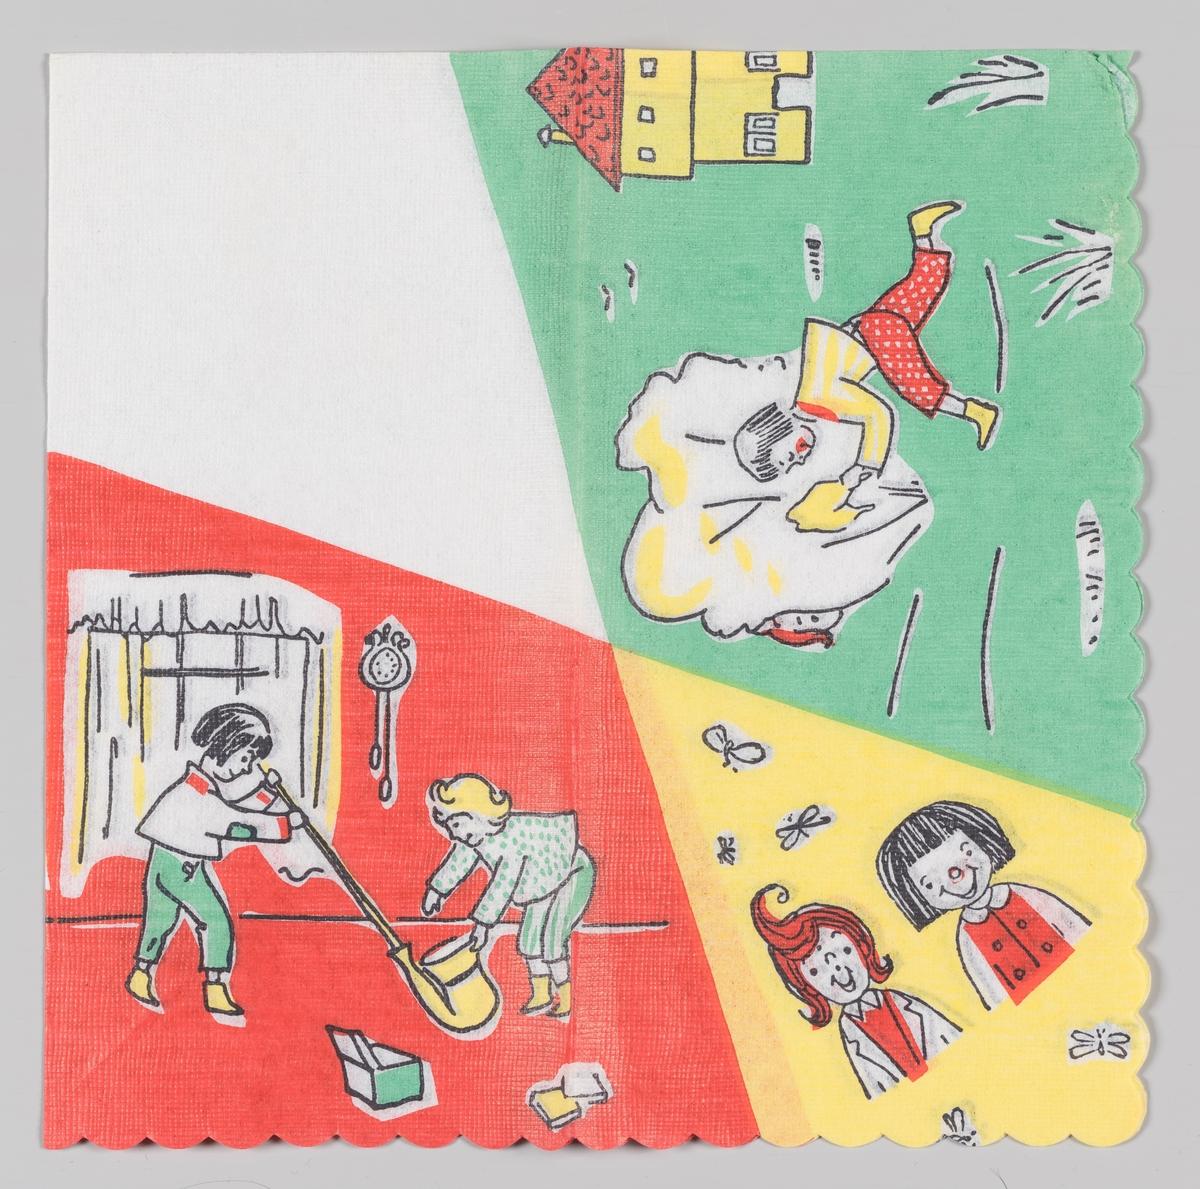 Tre scener: To jenter i et hus. To smilende jenter. En jente i en hage.